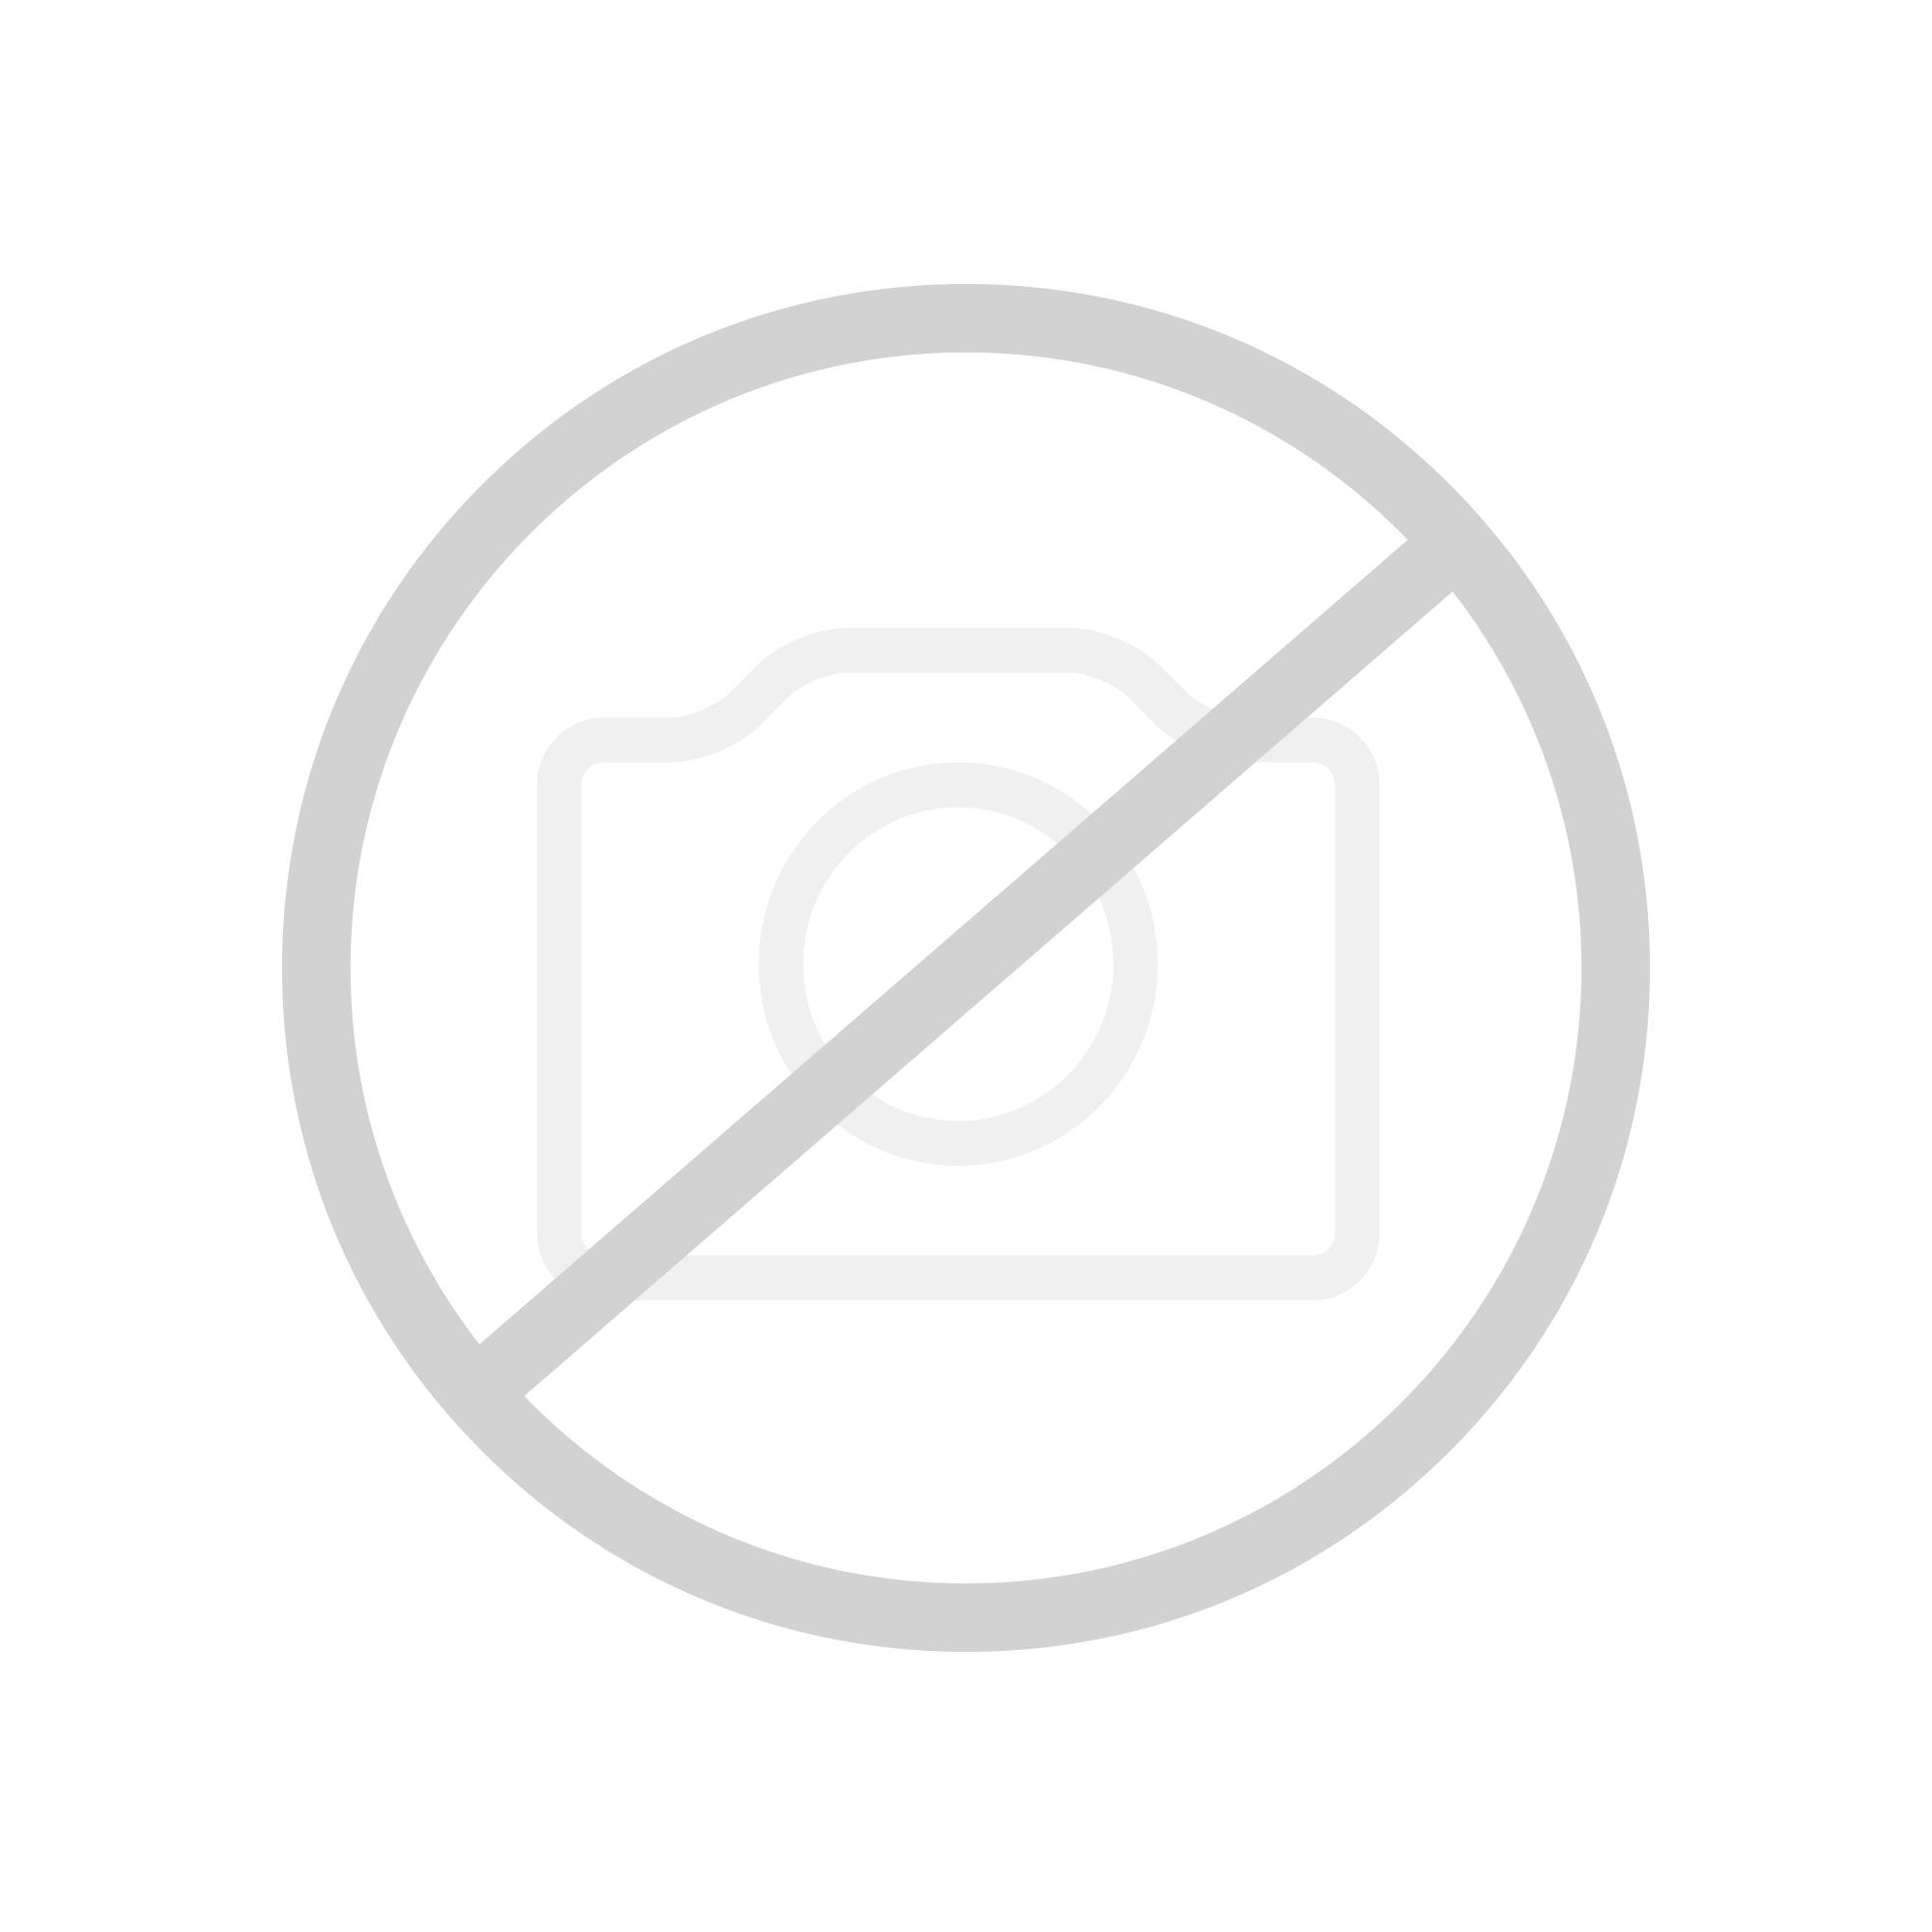 ideal standard active einhebel k chenarmatur mit ger teabsperrventil niederdruck chrom. Black Bedroom Furniture Sets. Home Design Ideas